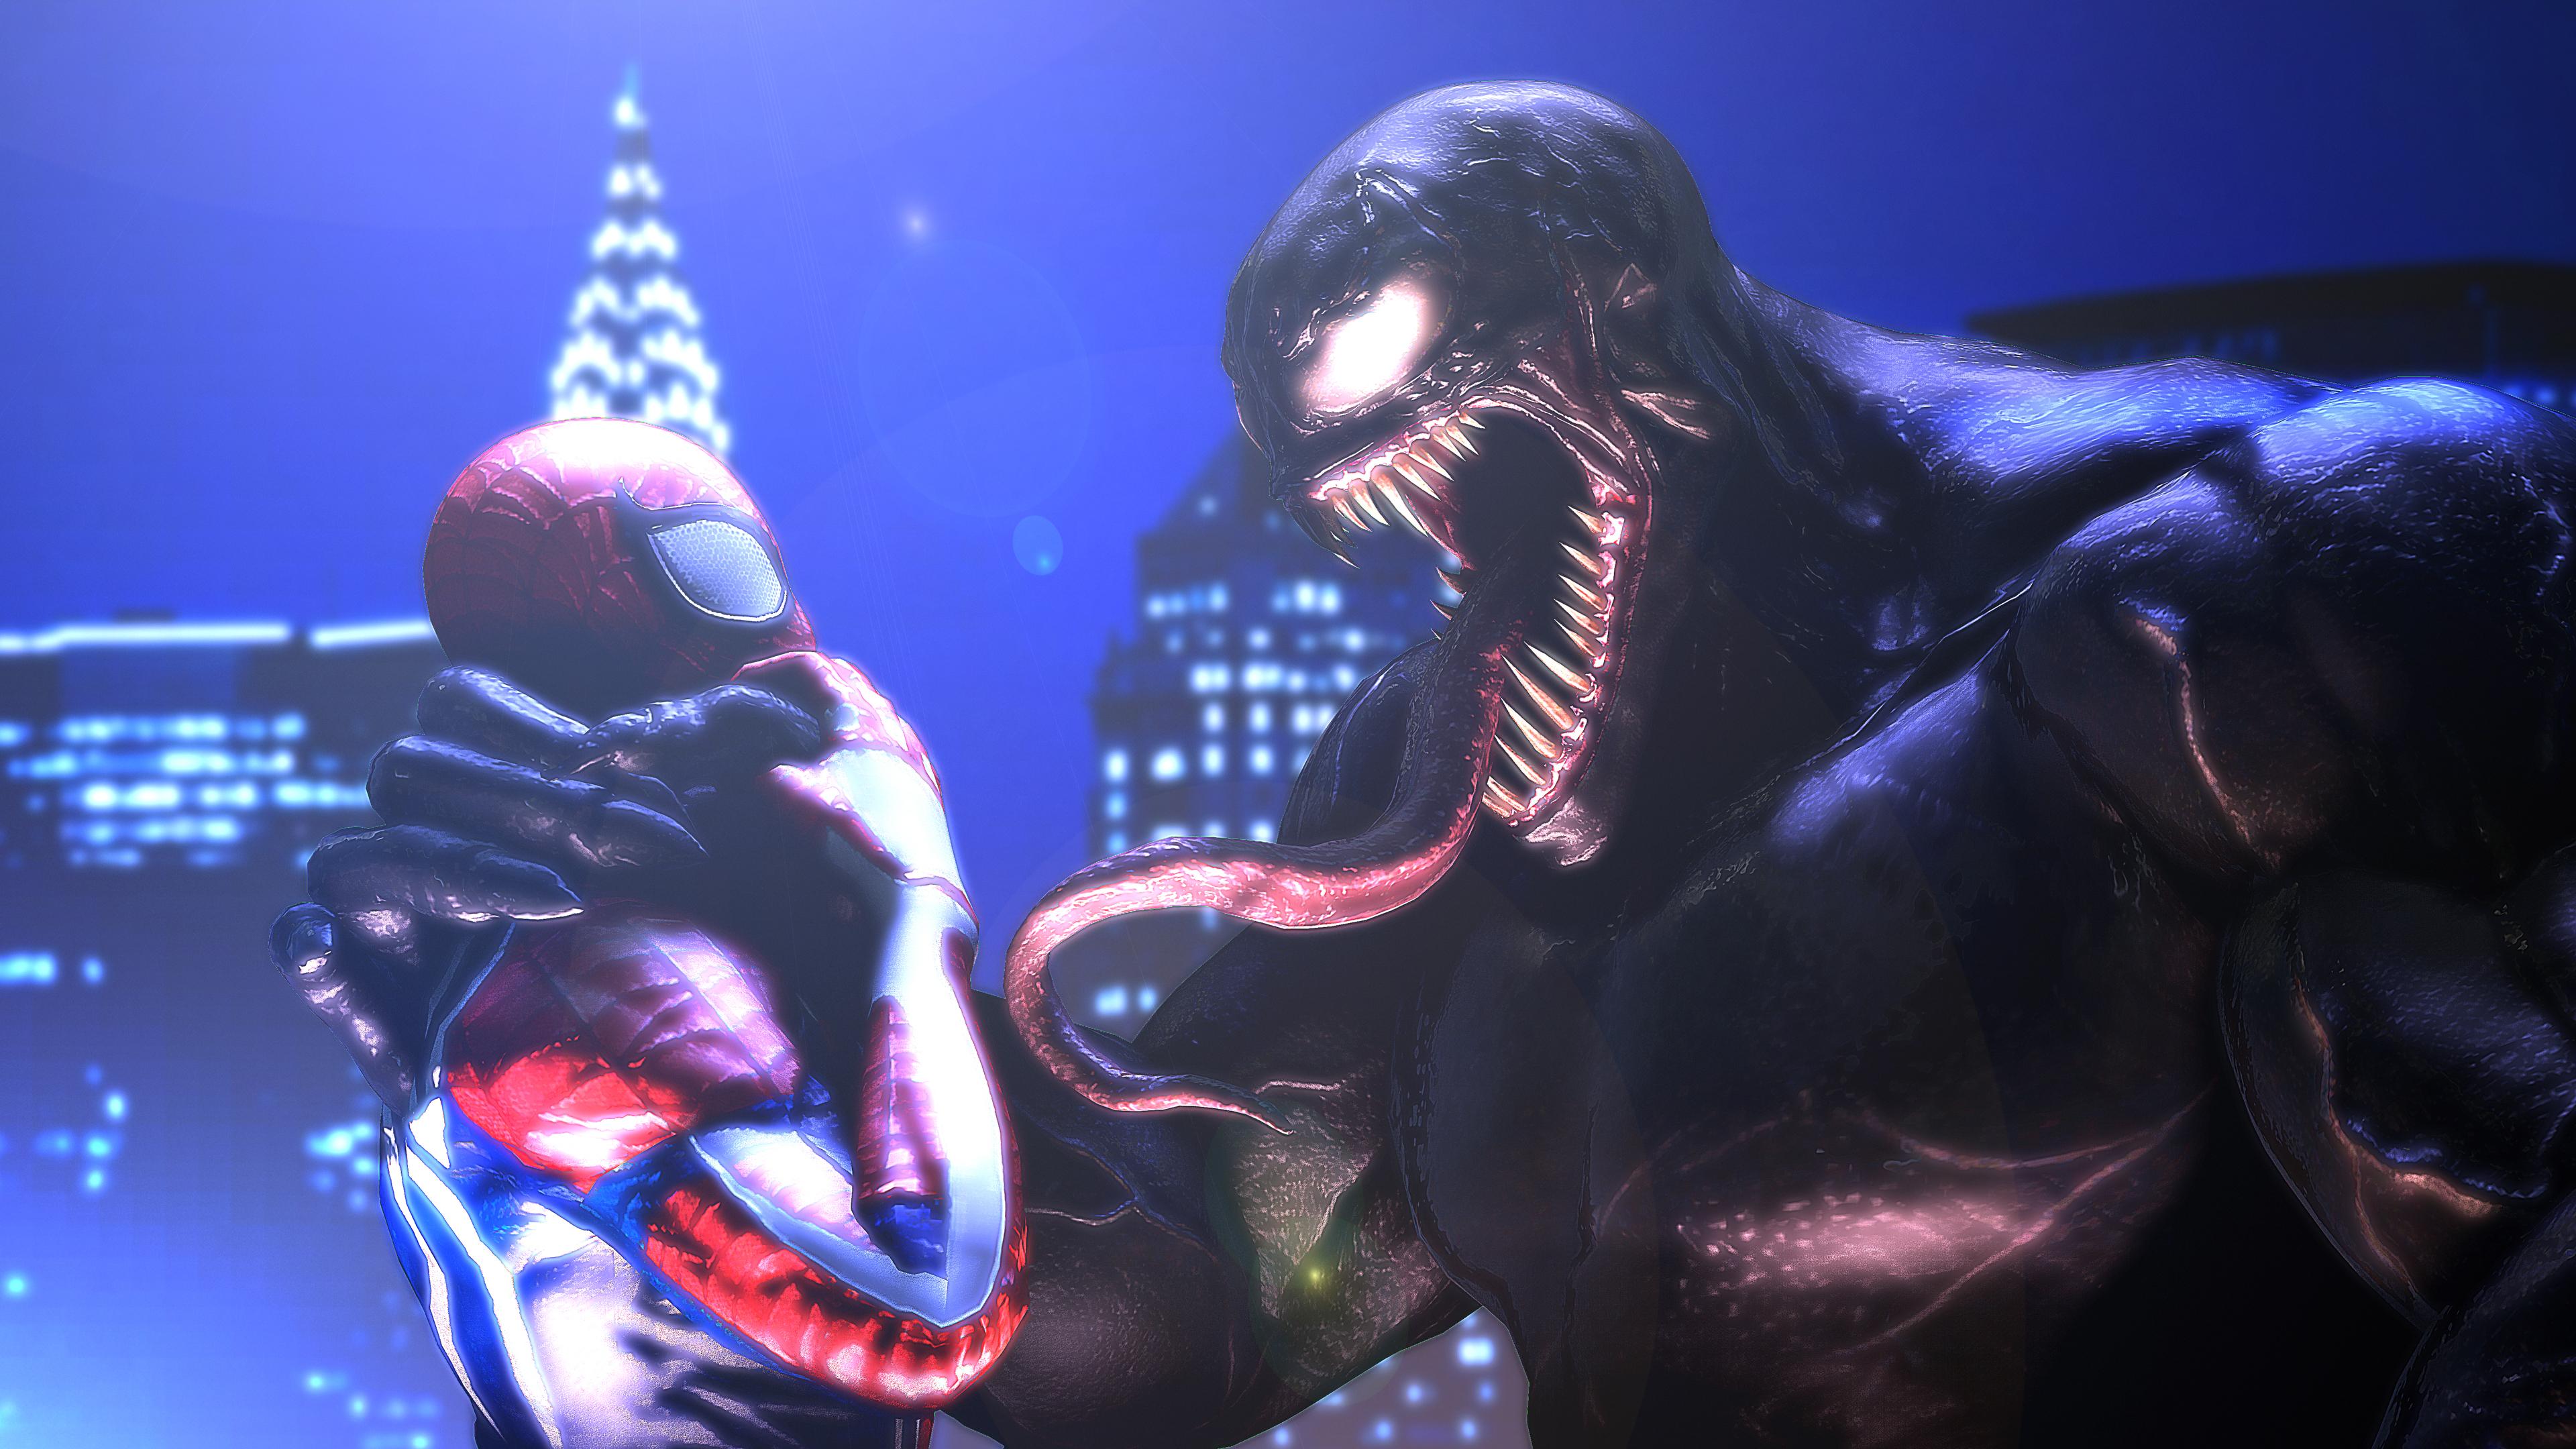 spiderman and venom 5k 1541294310 - Spiderman And Venom 5k - Venom wallpapers, superheroes wallpapers, spiderman wallpapers, hd-wallpapers, digital art wallpapers, deviantart wallpapers, artwork wallpapers, artist wallpapers, 5k wallpapers, 4k-wallpapers